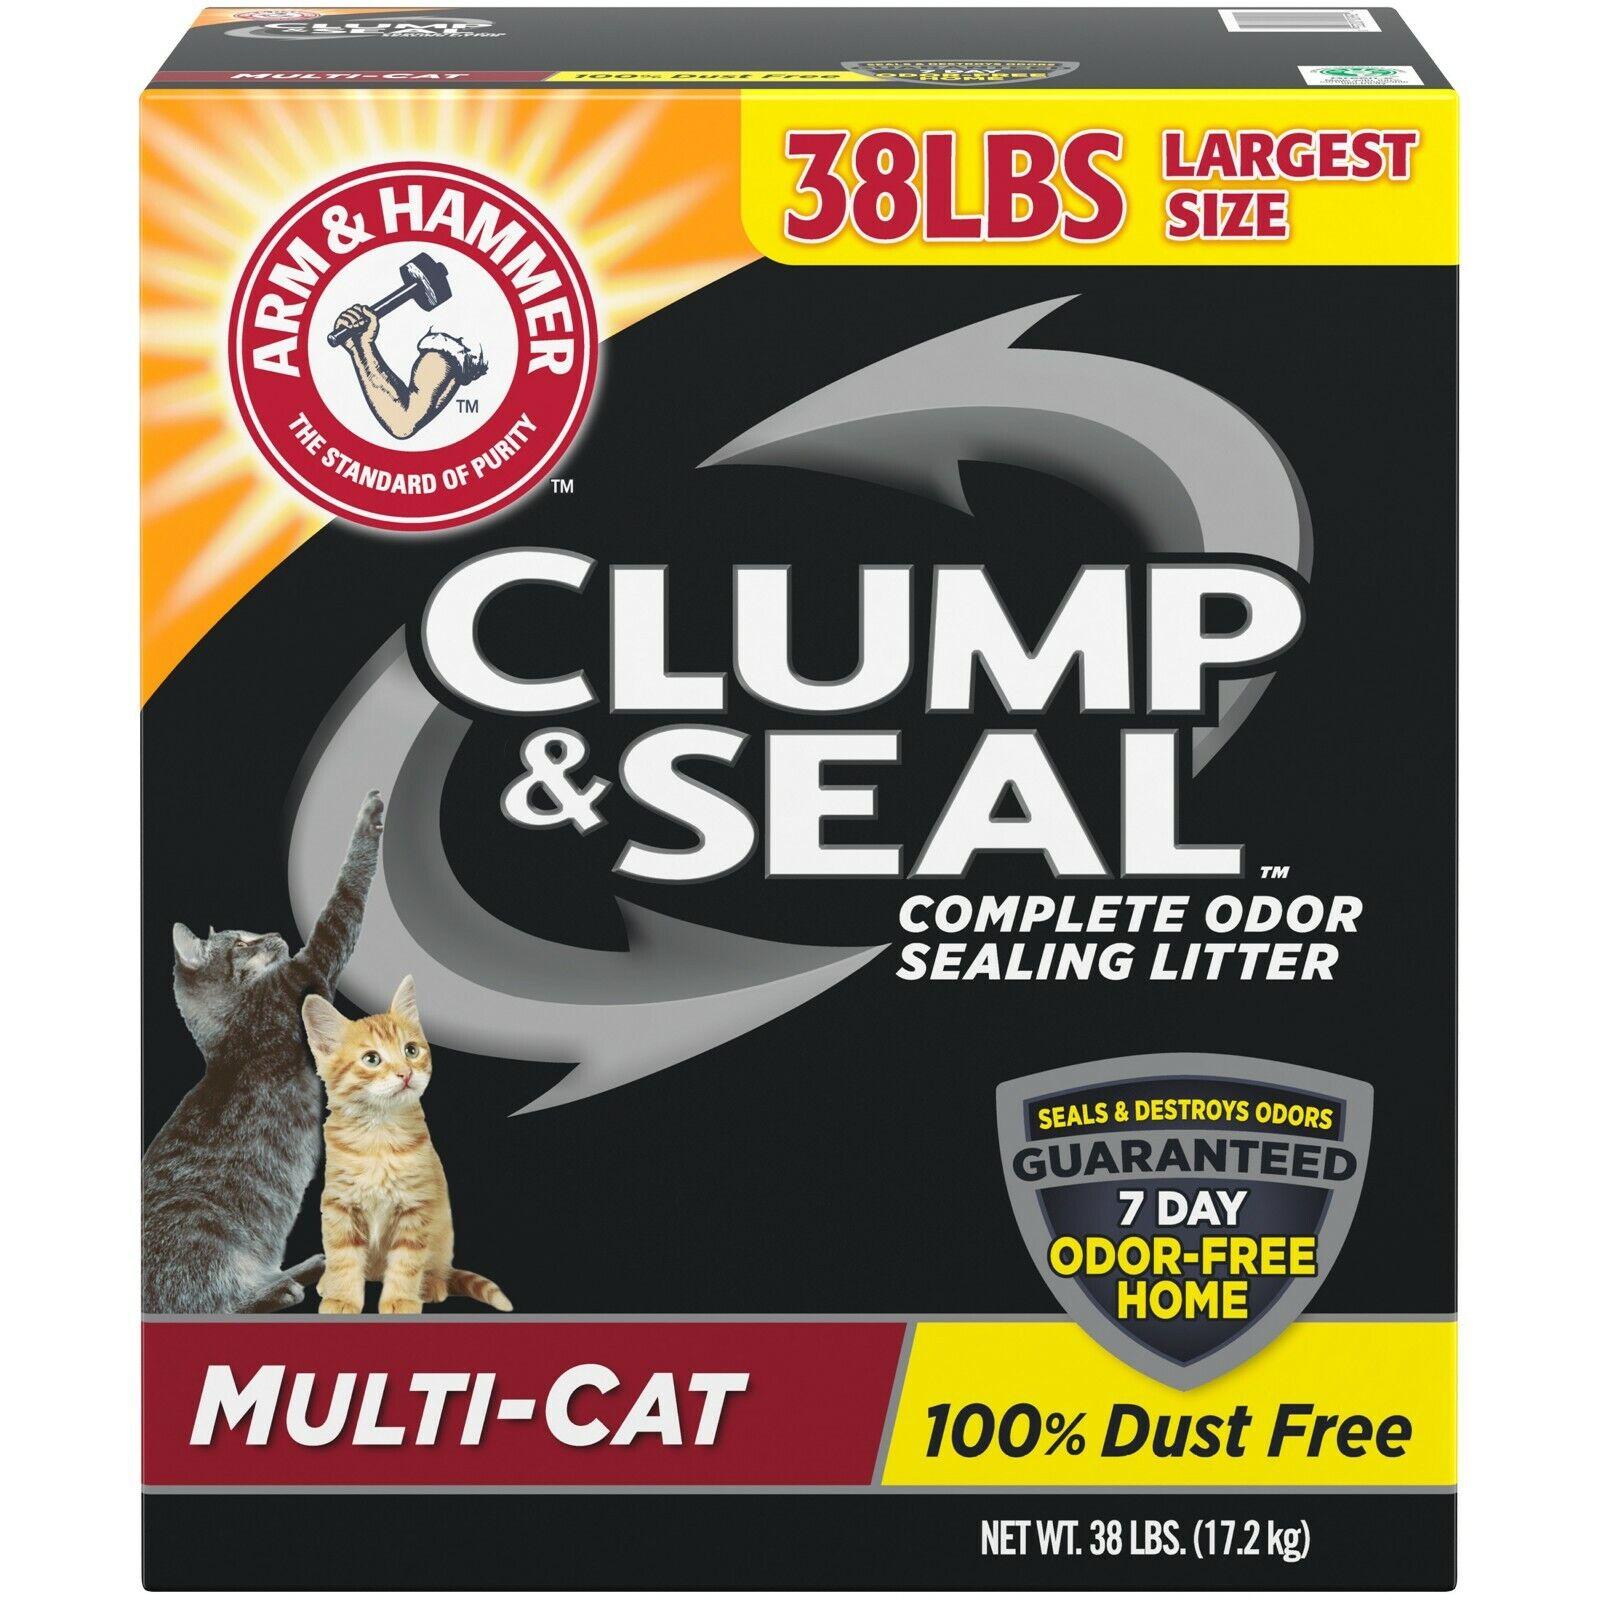 ARM & HAMMER Clump & Seal Platinum Cat Litter, Multi-Cat, 2x